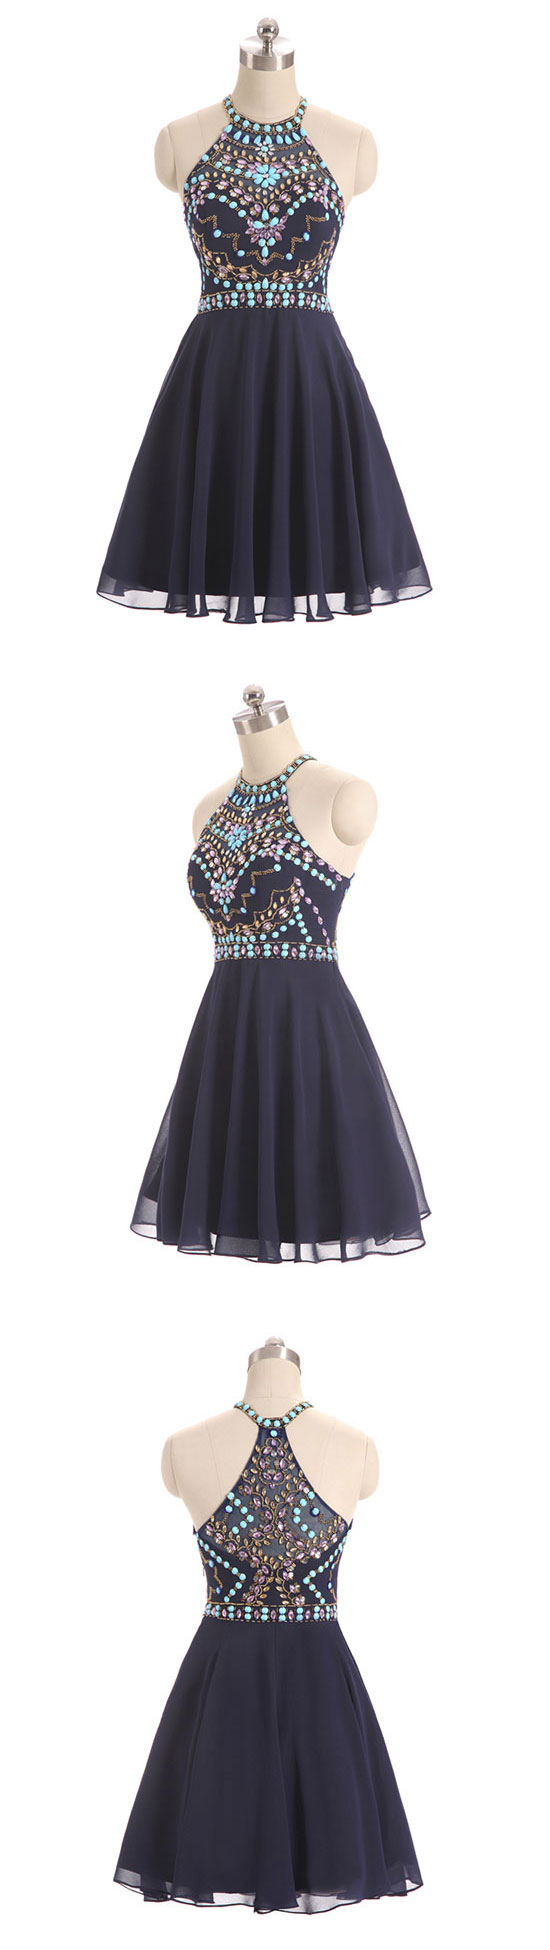 Dark blue beads short prom dress cute dark blue homecoming dress